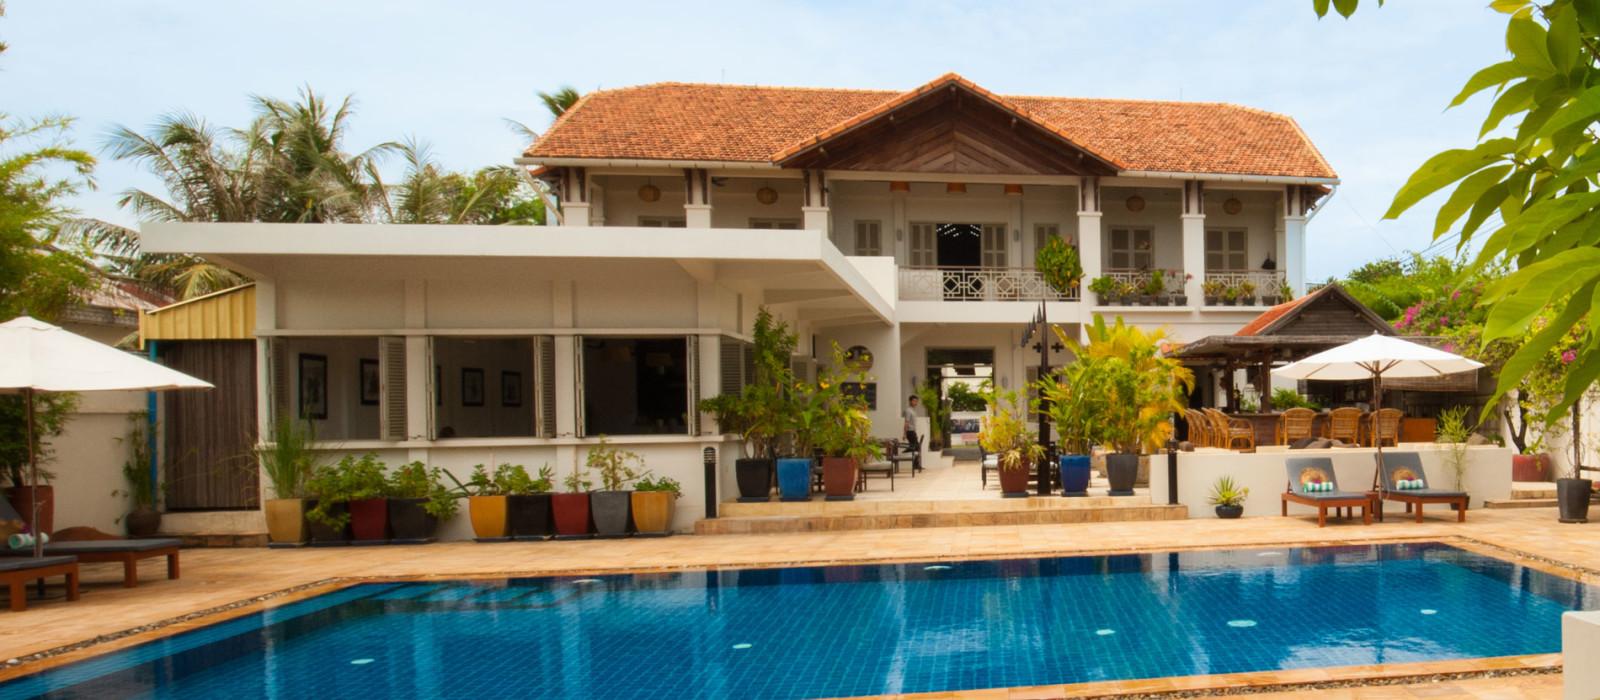 Hotel Bambu  Kambodscha